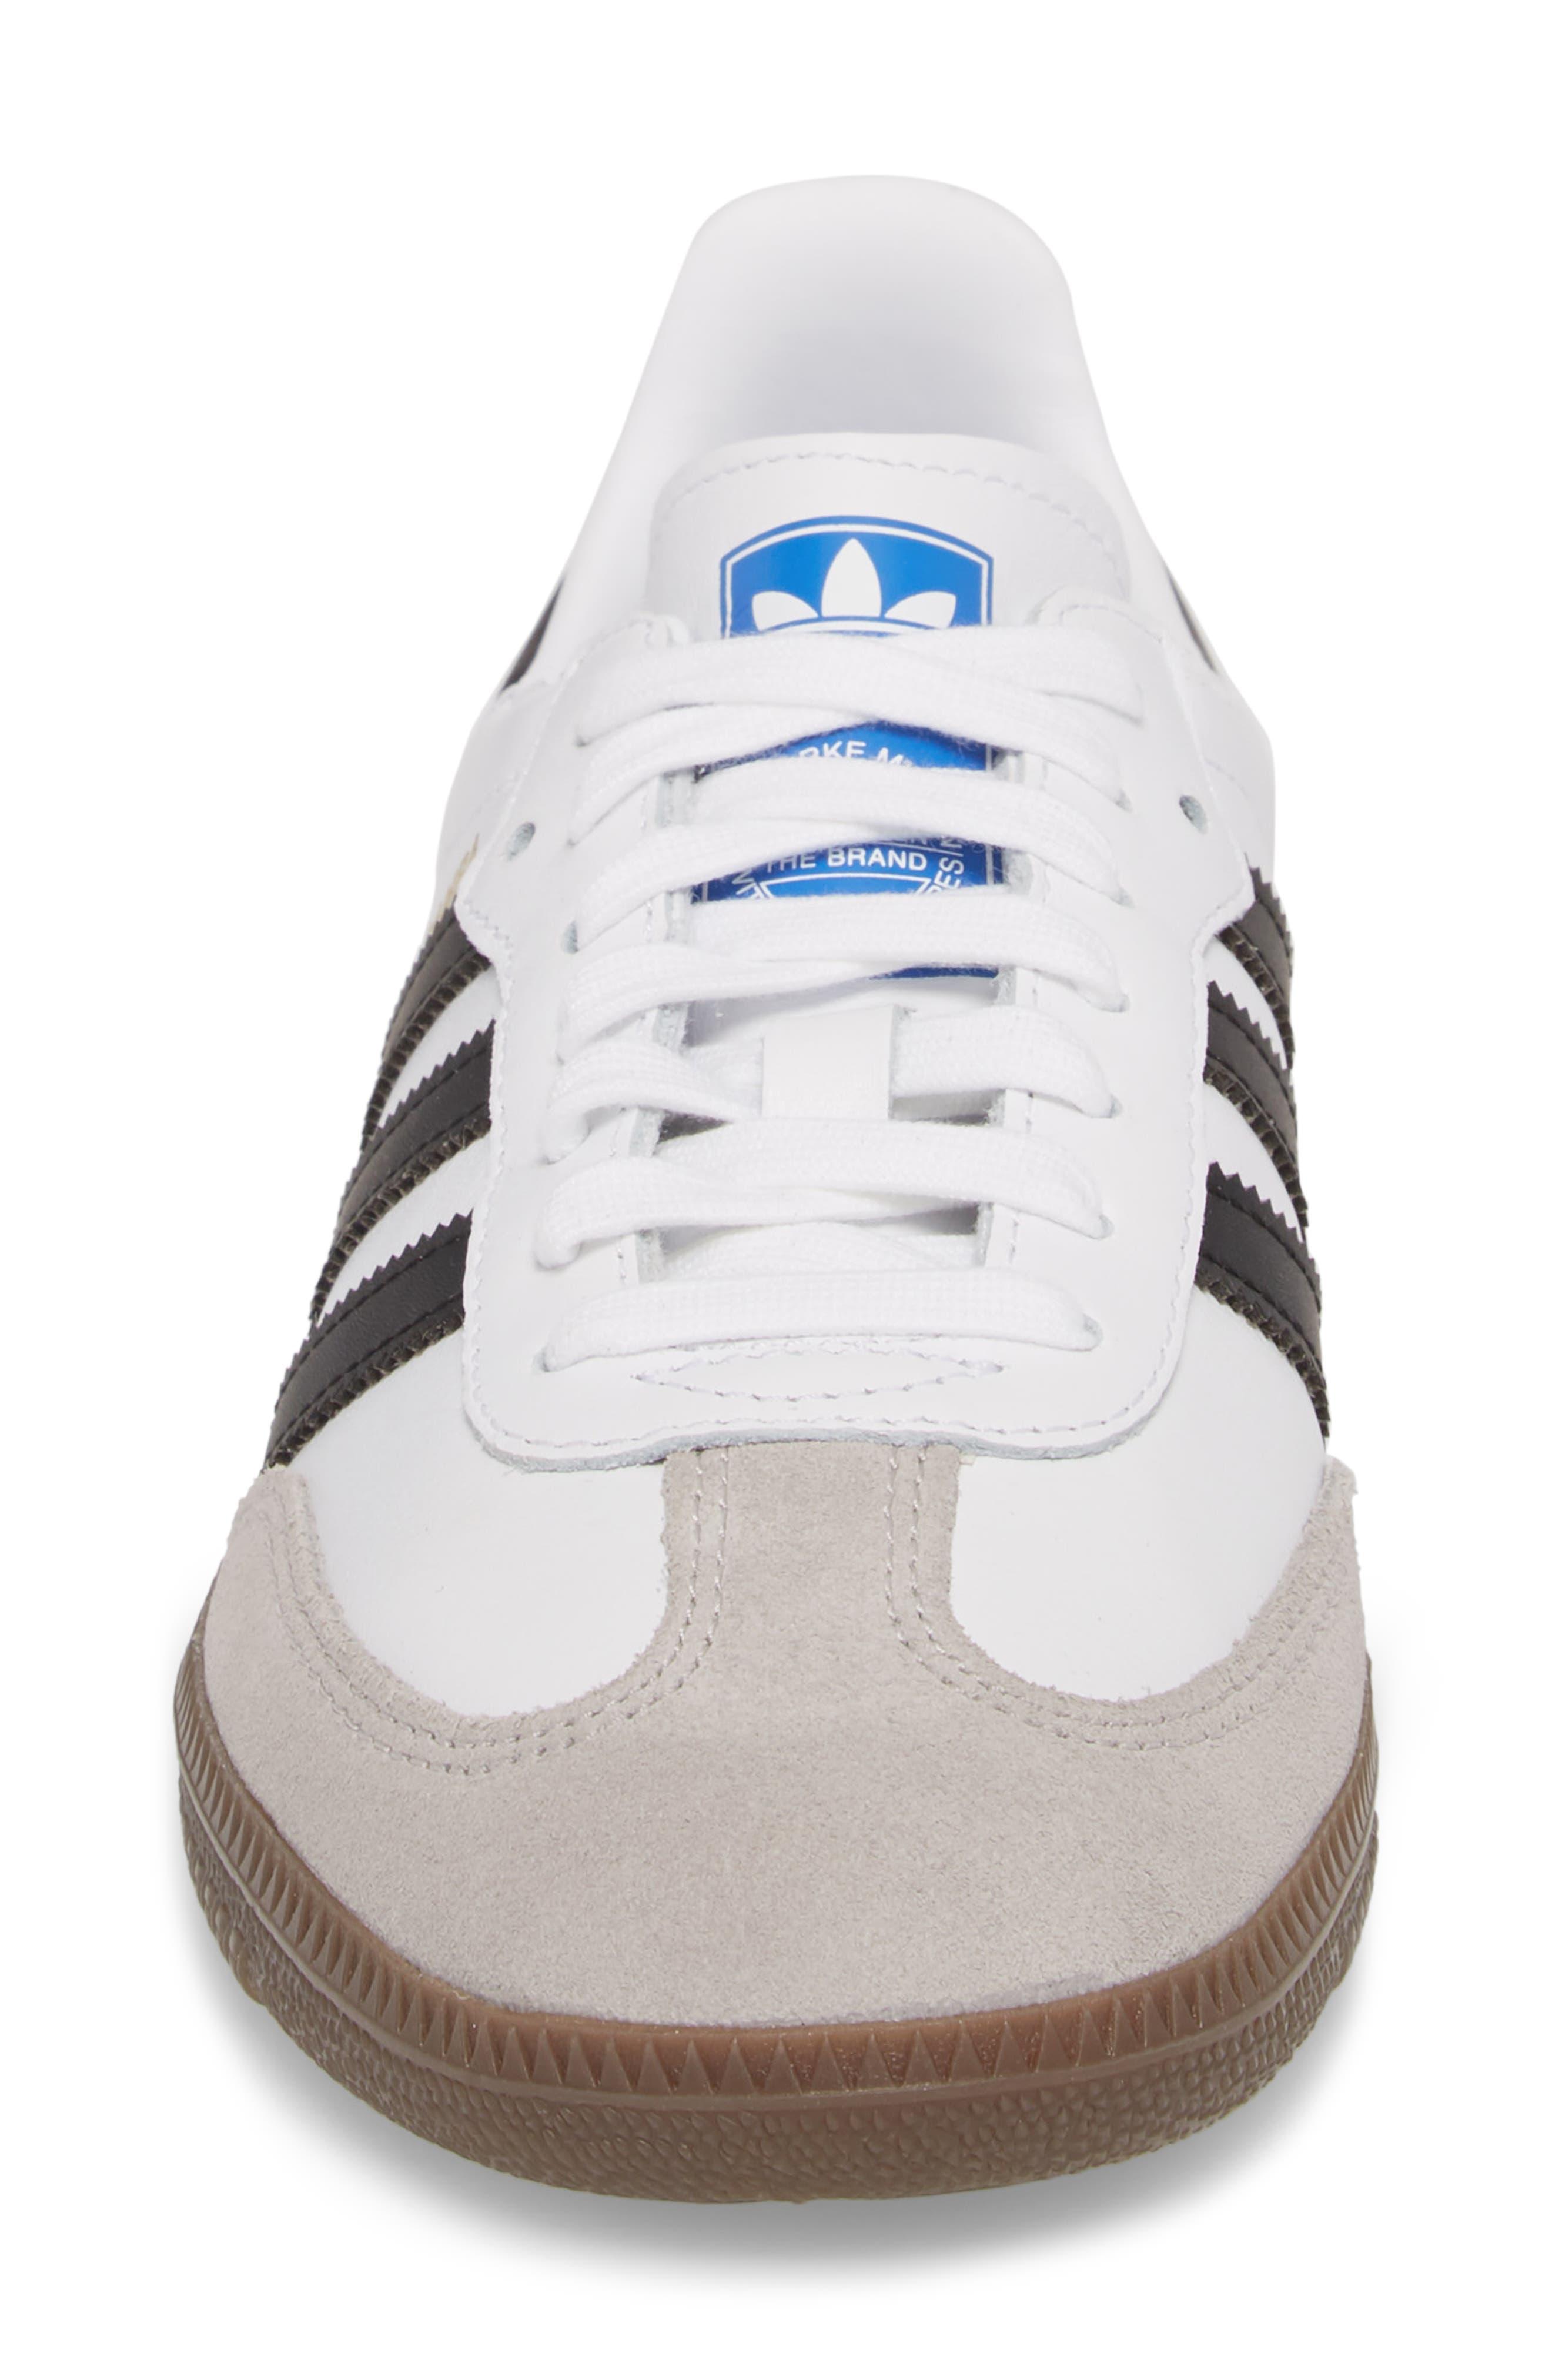 'Samba' Sneaker,                             Alternate thumbnail 6, color,                             White/ Black/ Clear Granite